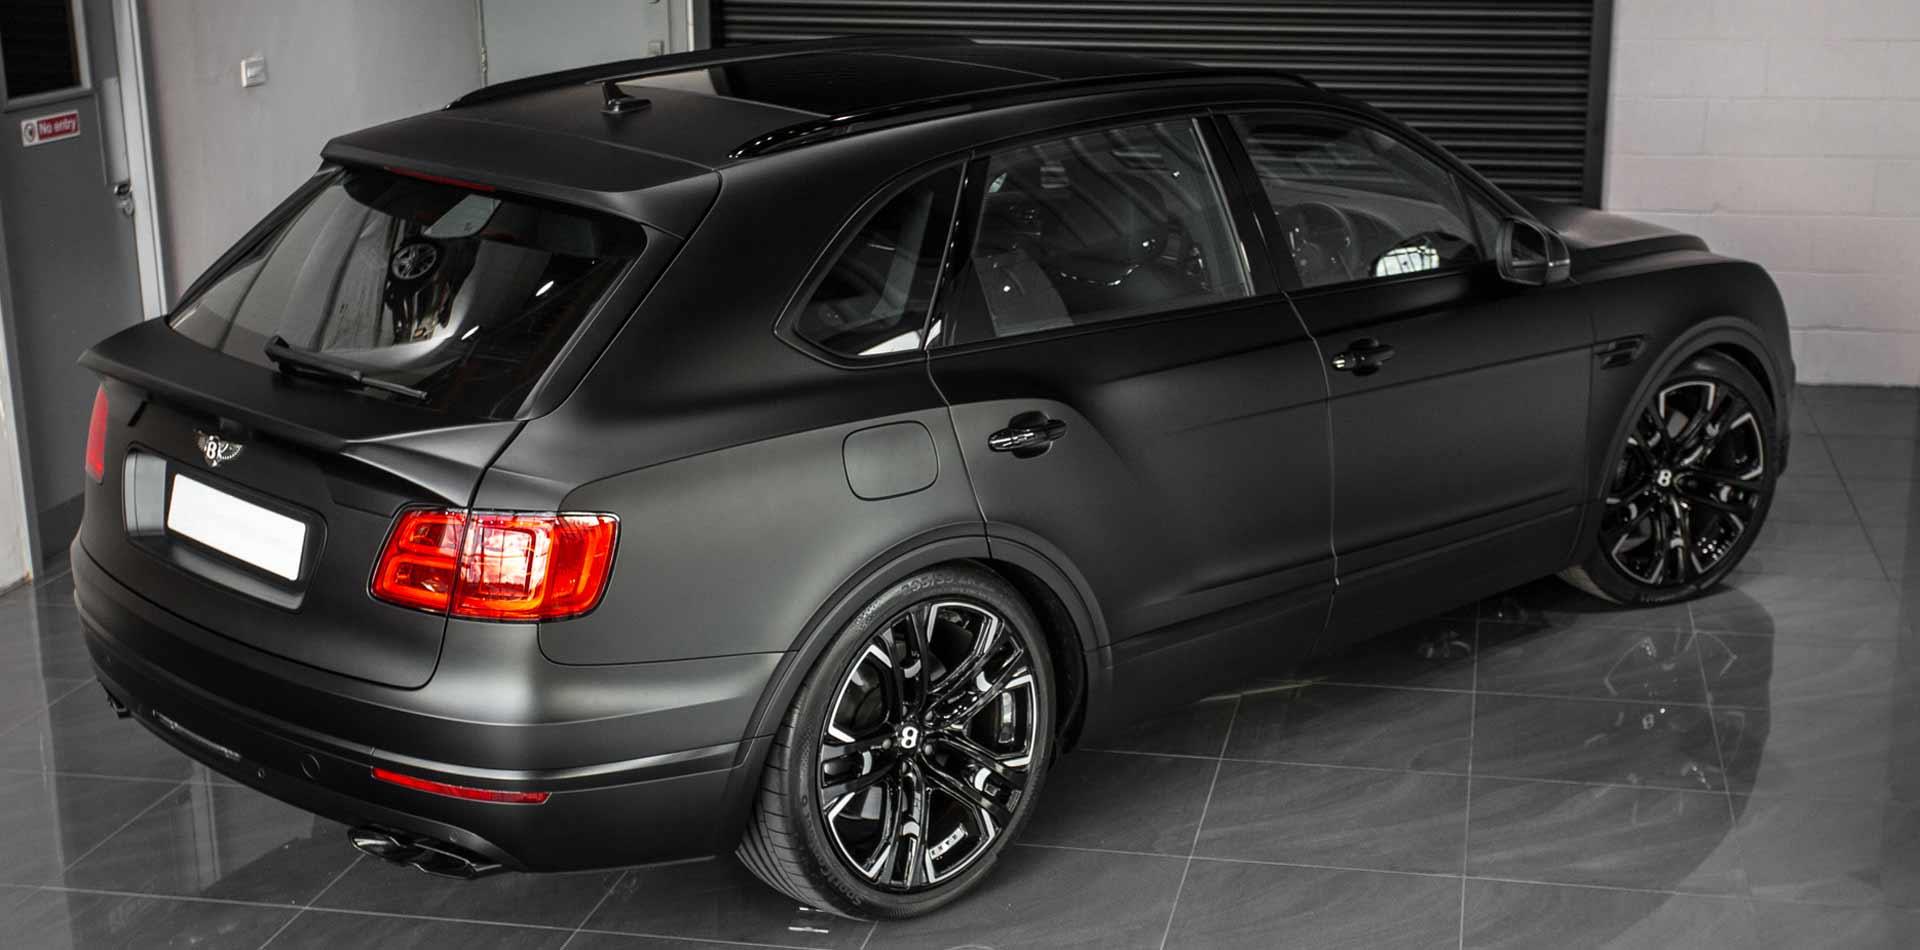 10×23 Zoll LeMans Felge an Bentley Bentayga